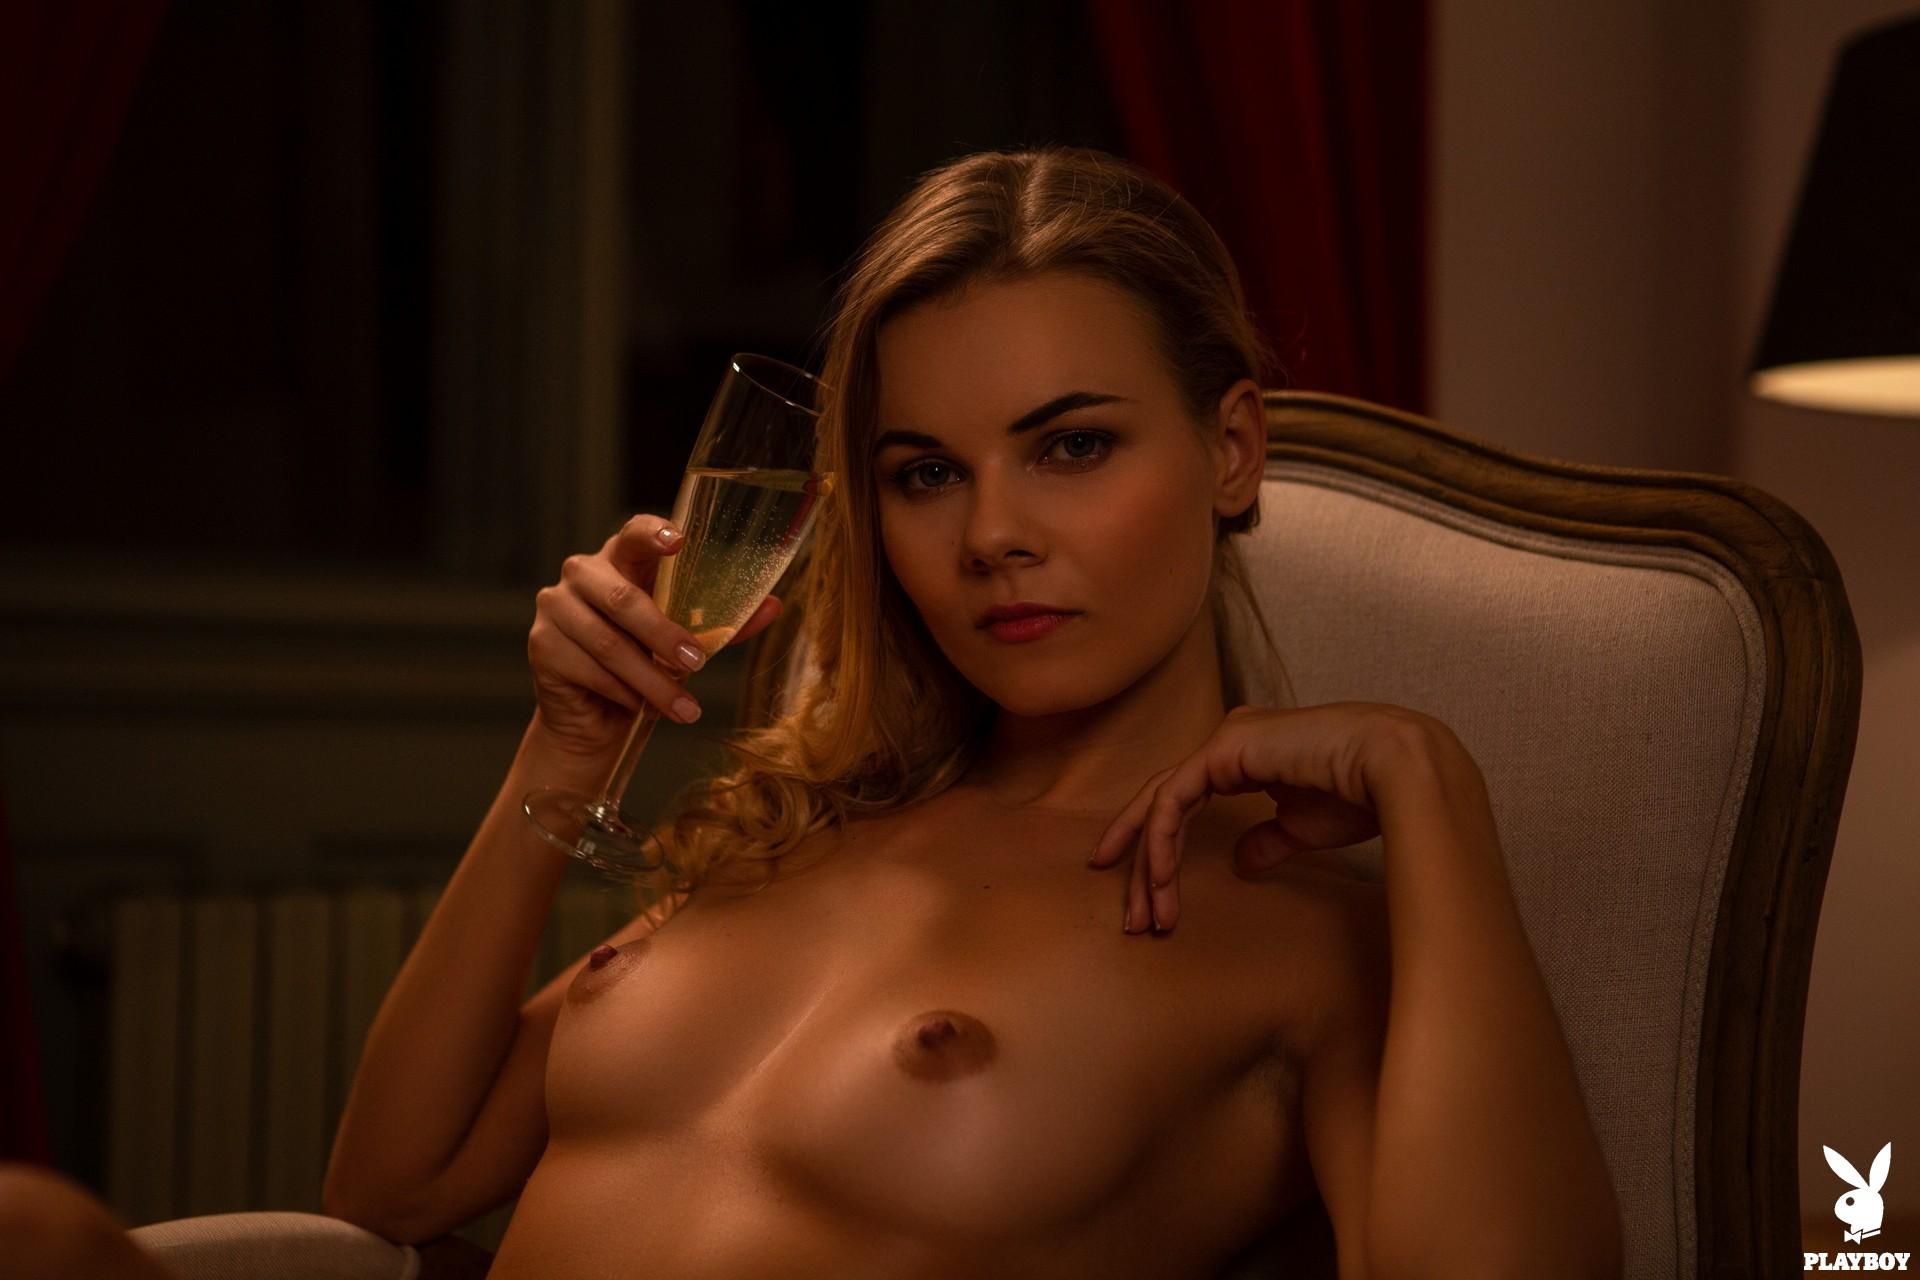 Kate Jones in Exquisite Allure - Playboy Plus 6